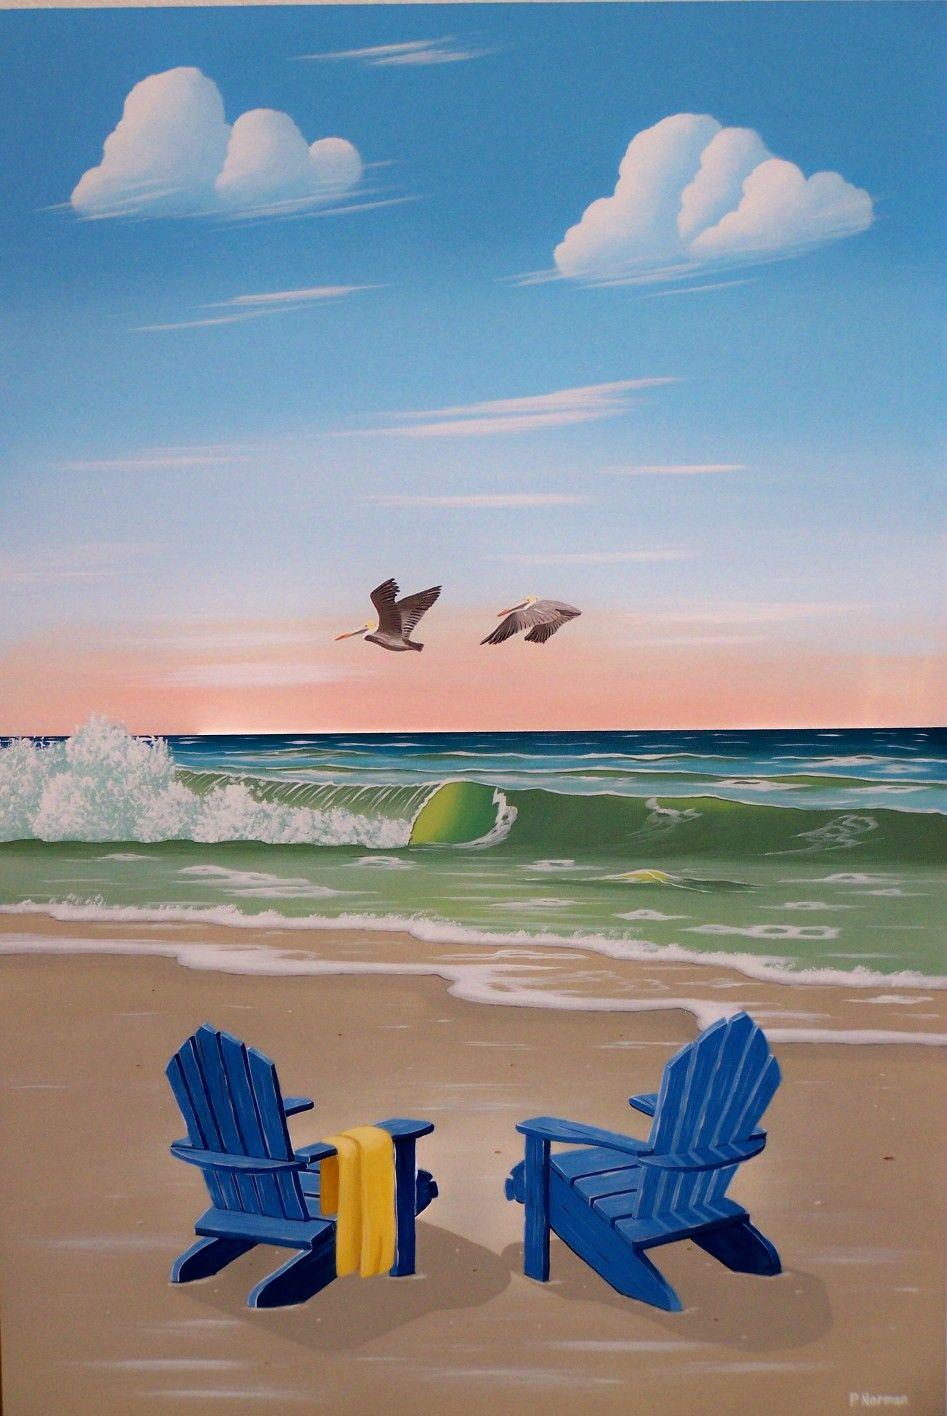 Beach chair with umbrella painting - Beach Chairs Art Pinterest